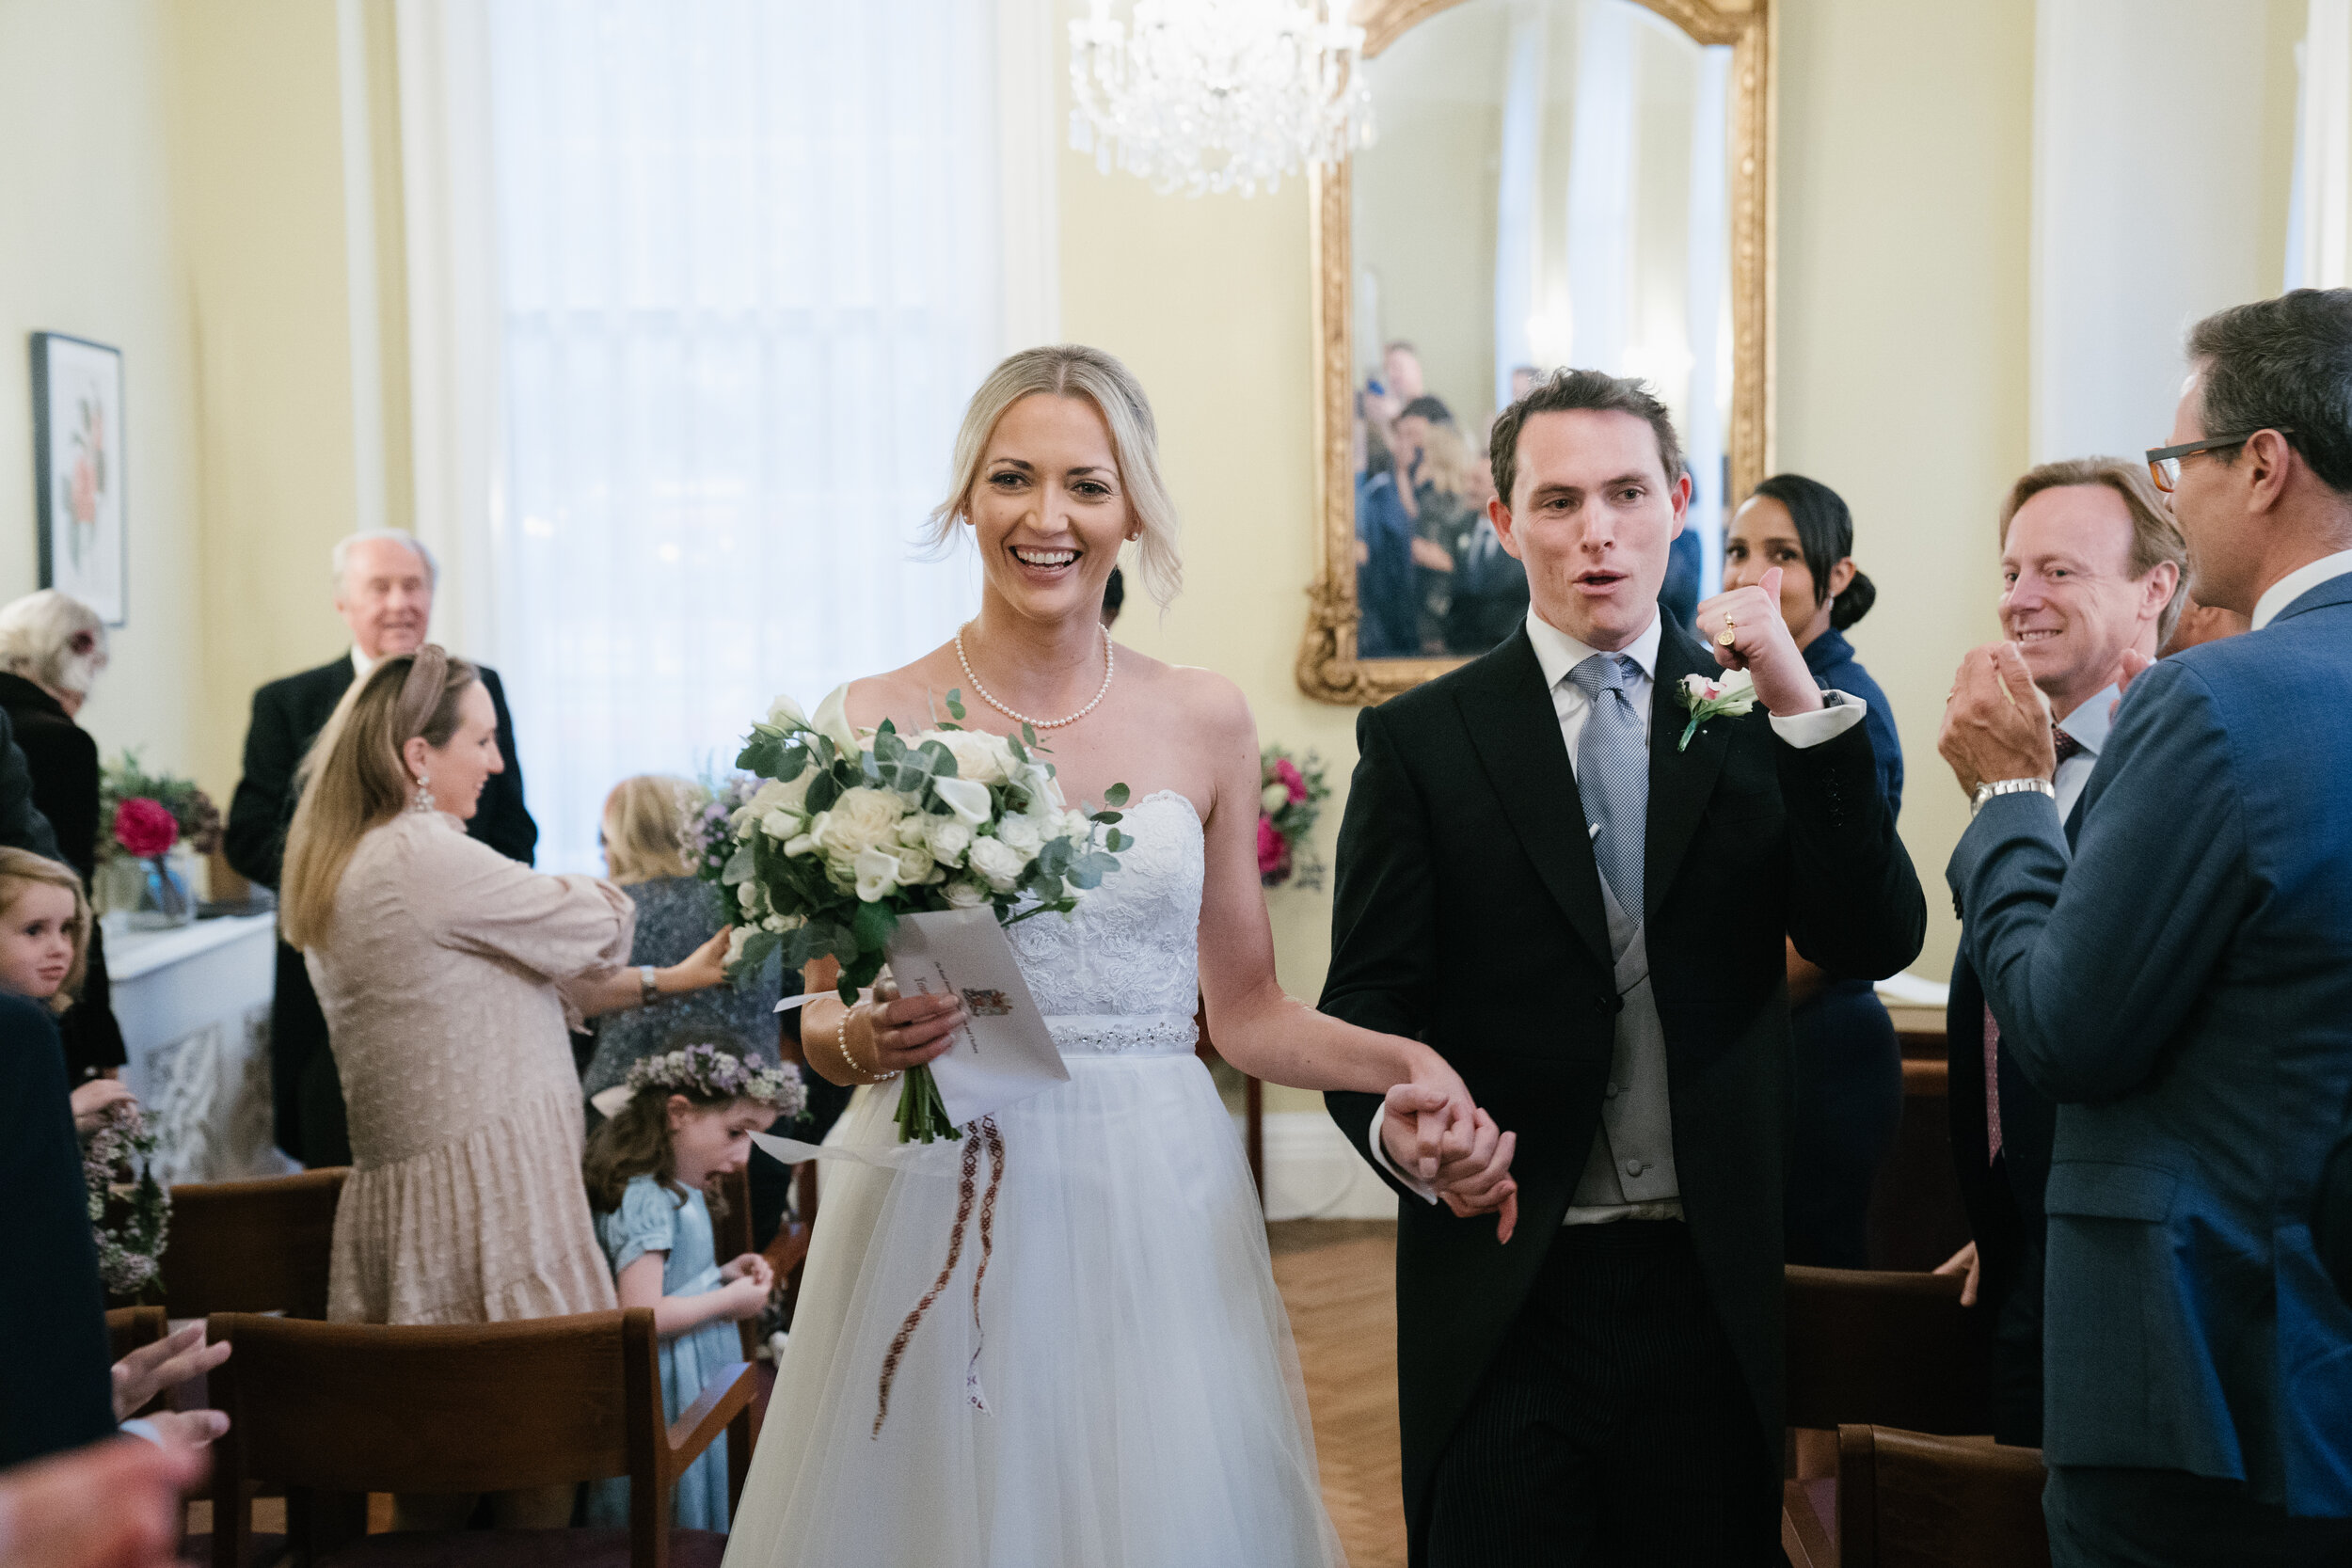 chelsea-london-wedding-photographer-videographer-chelsea-town-hall-31